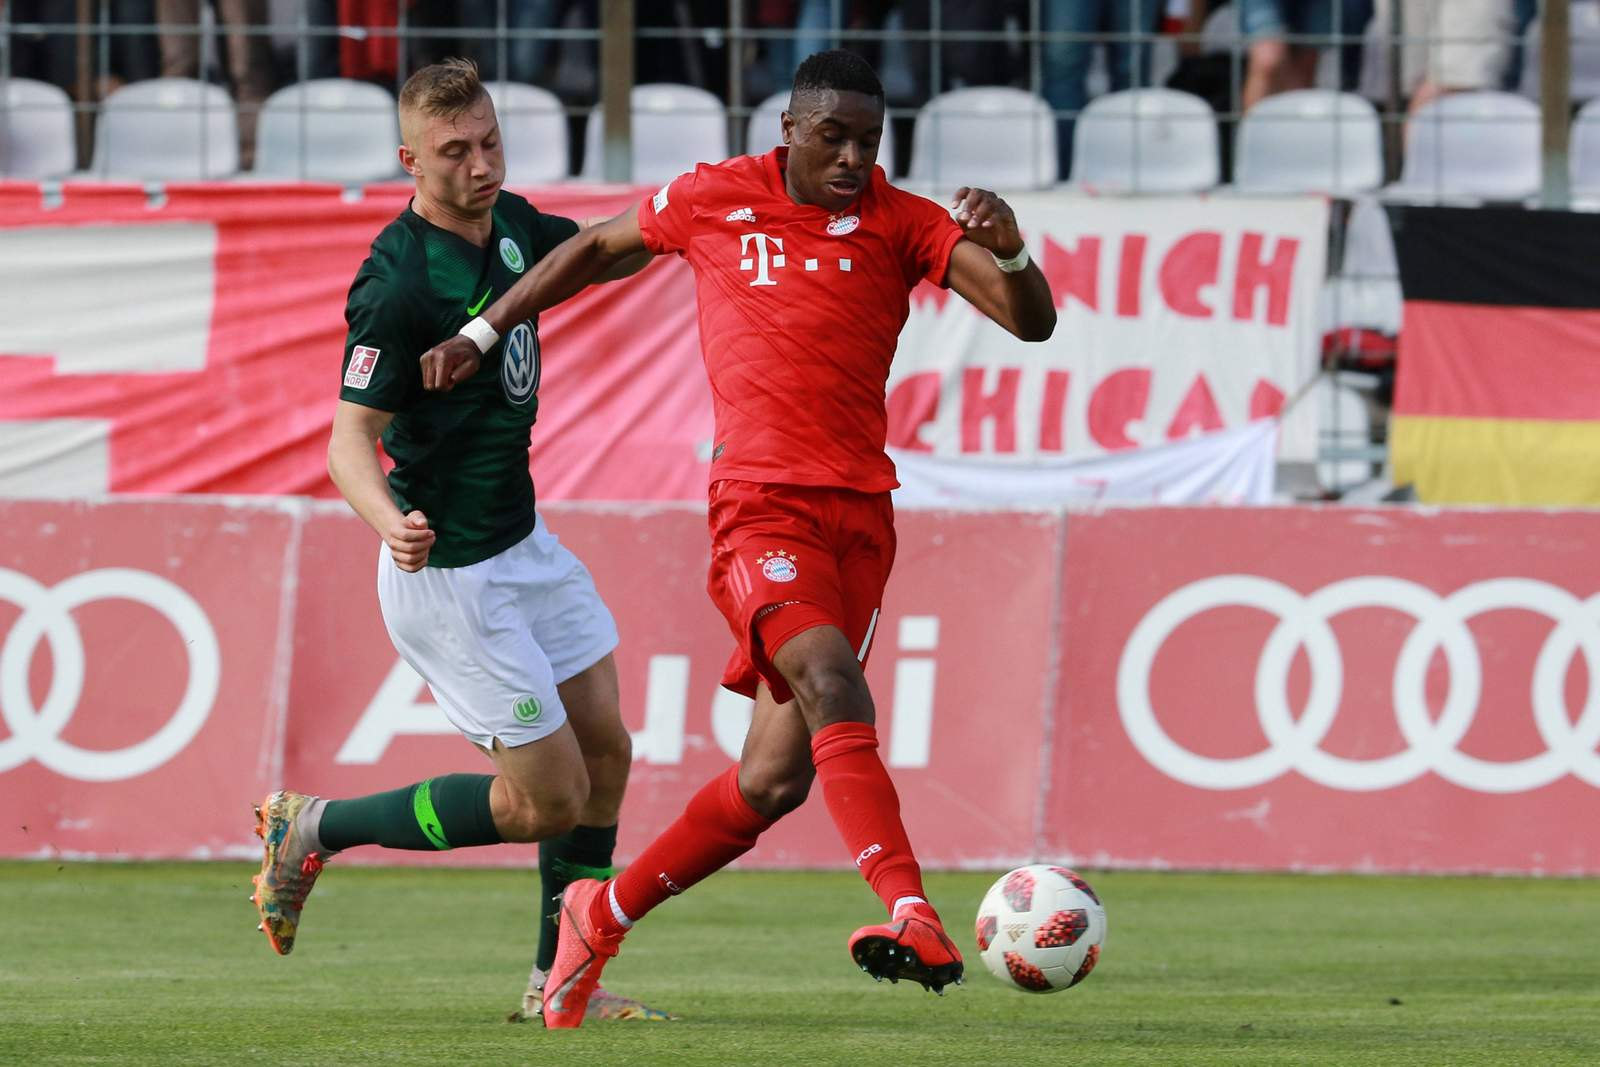 Maxime Awoudja bei der U23 des FC Bayern